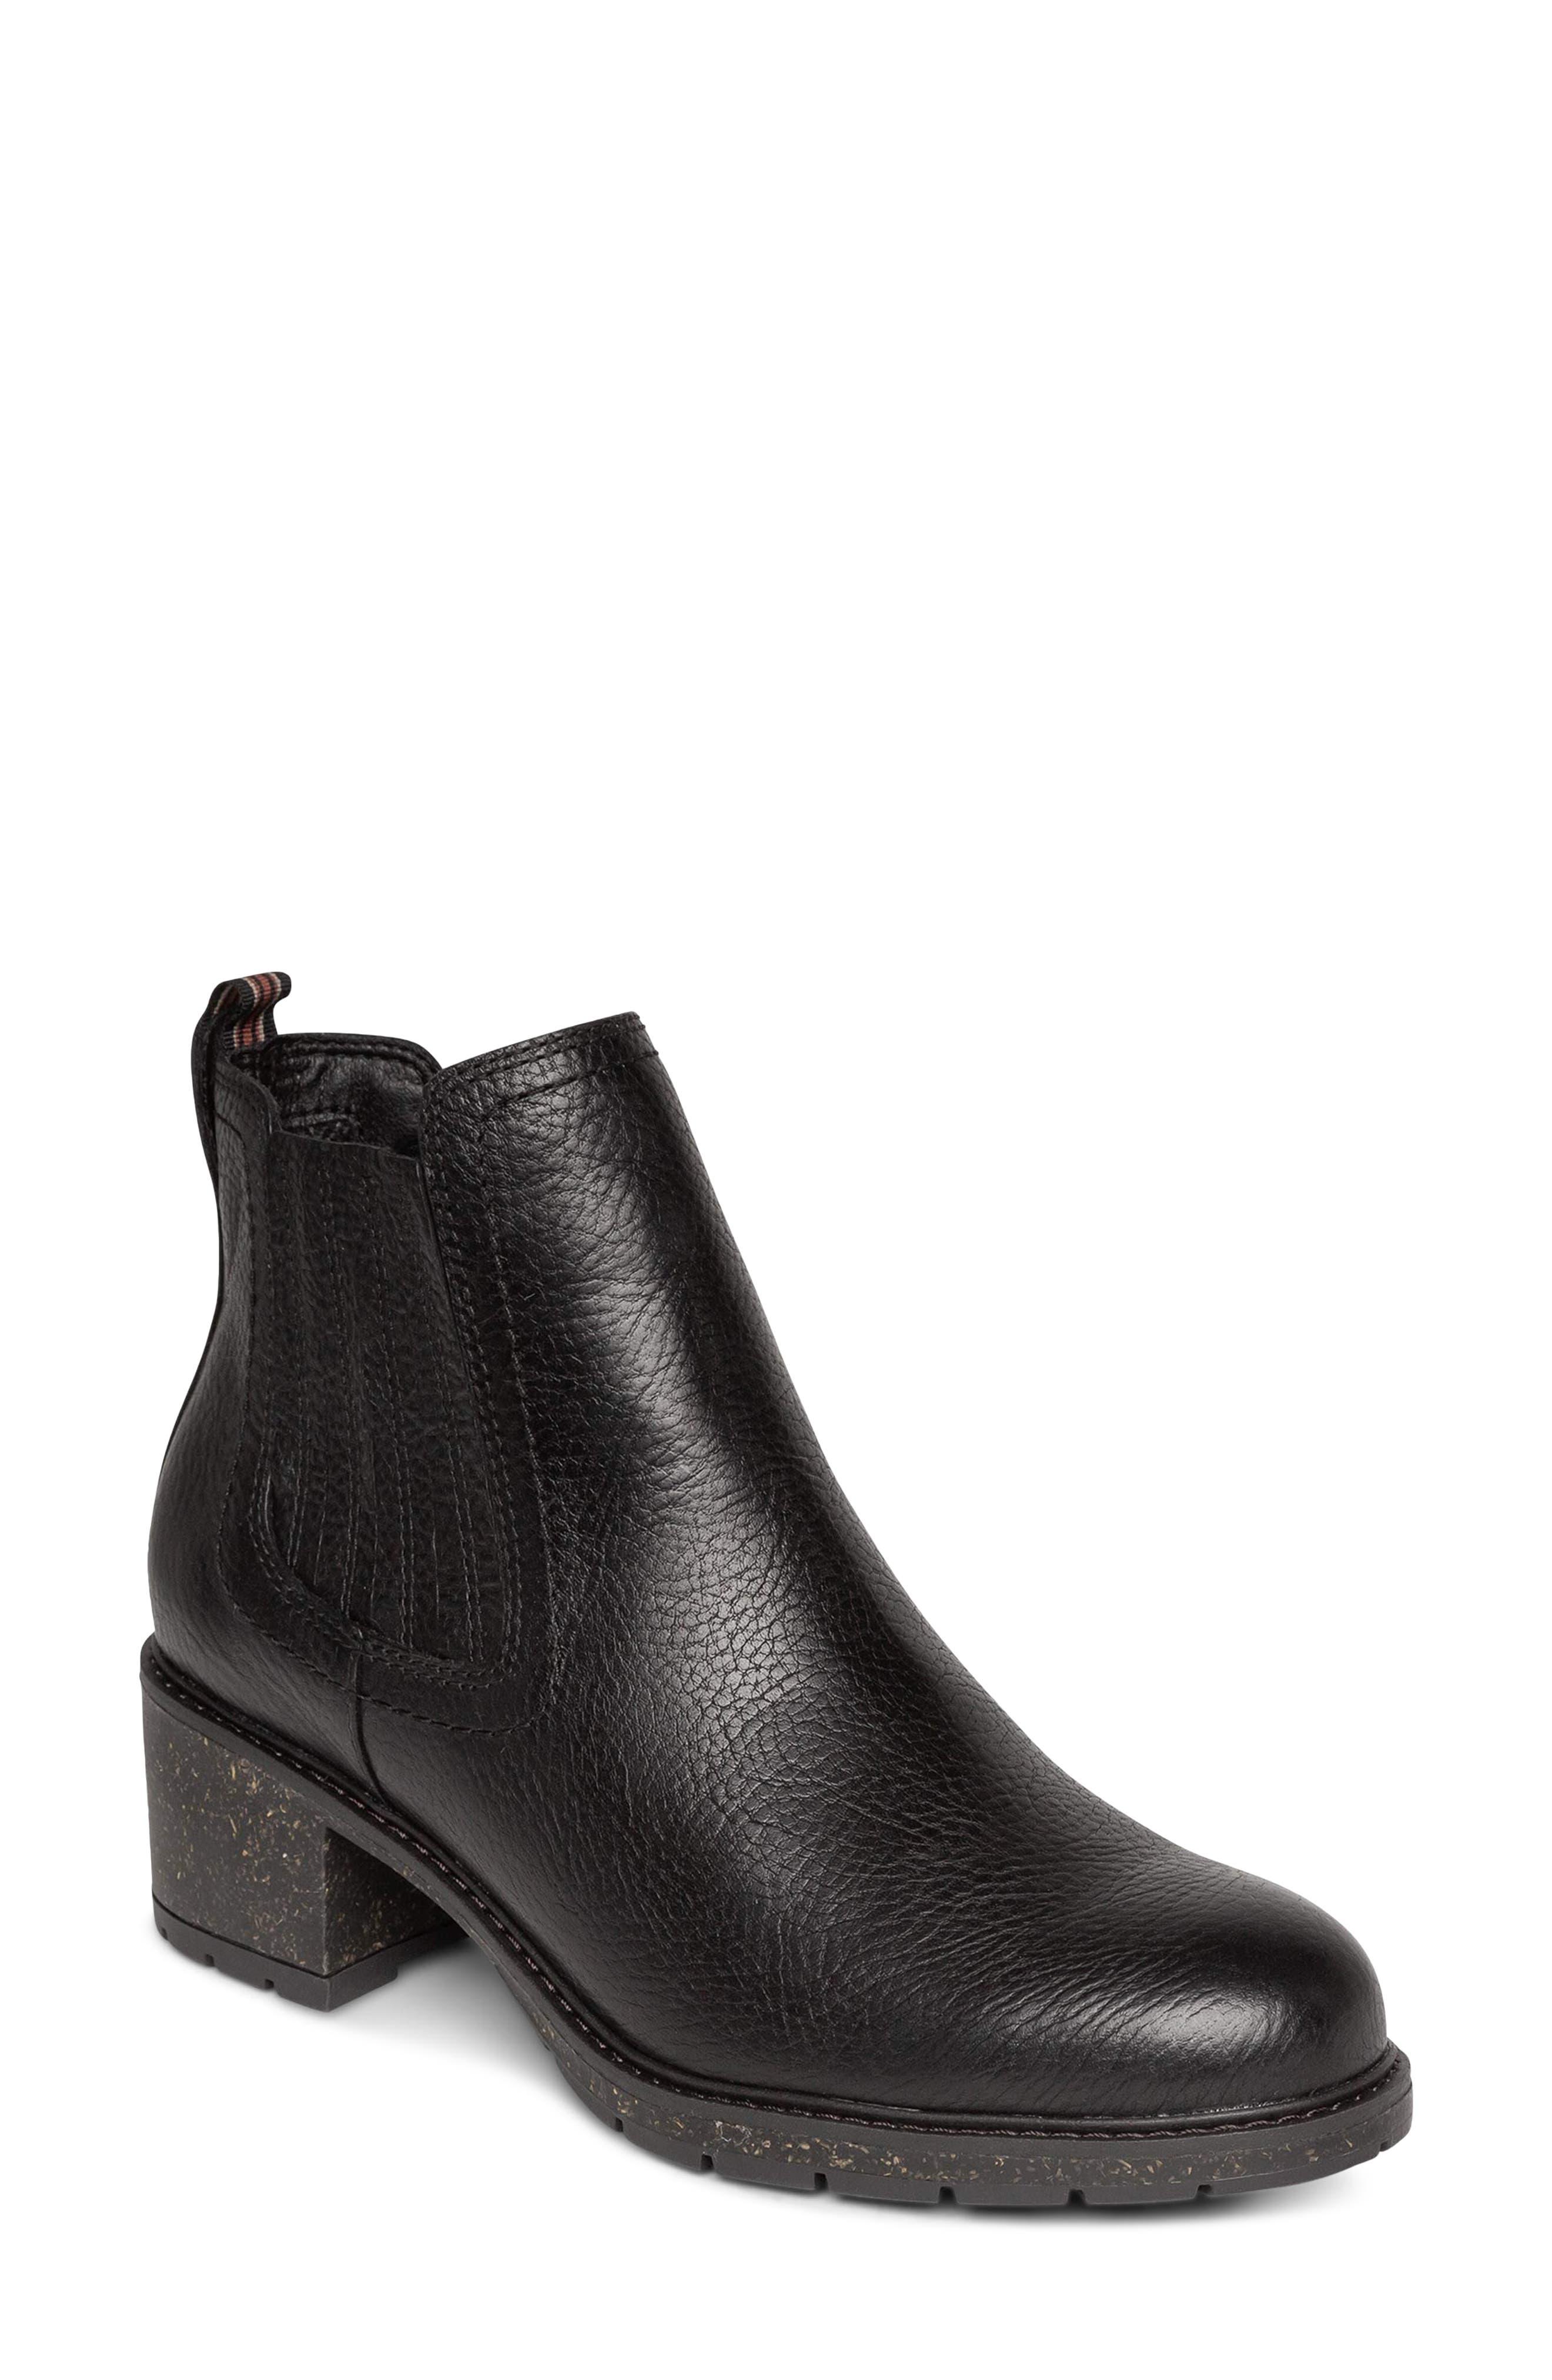 Willow Chelsea Boot